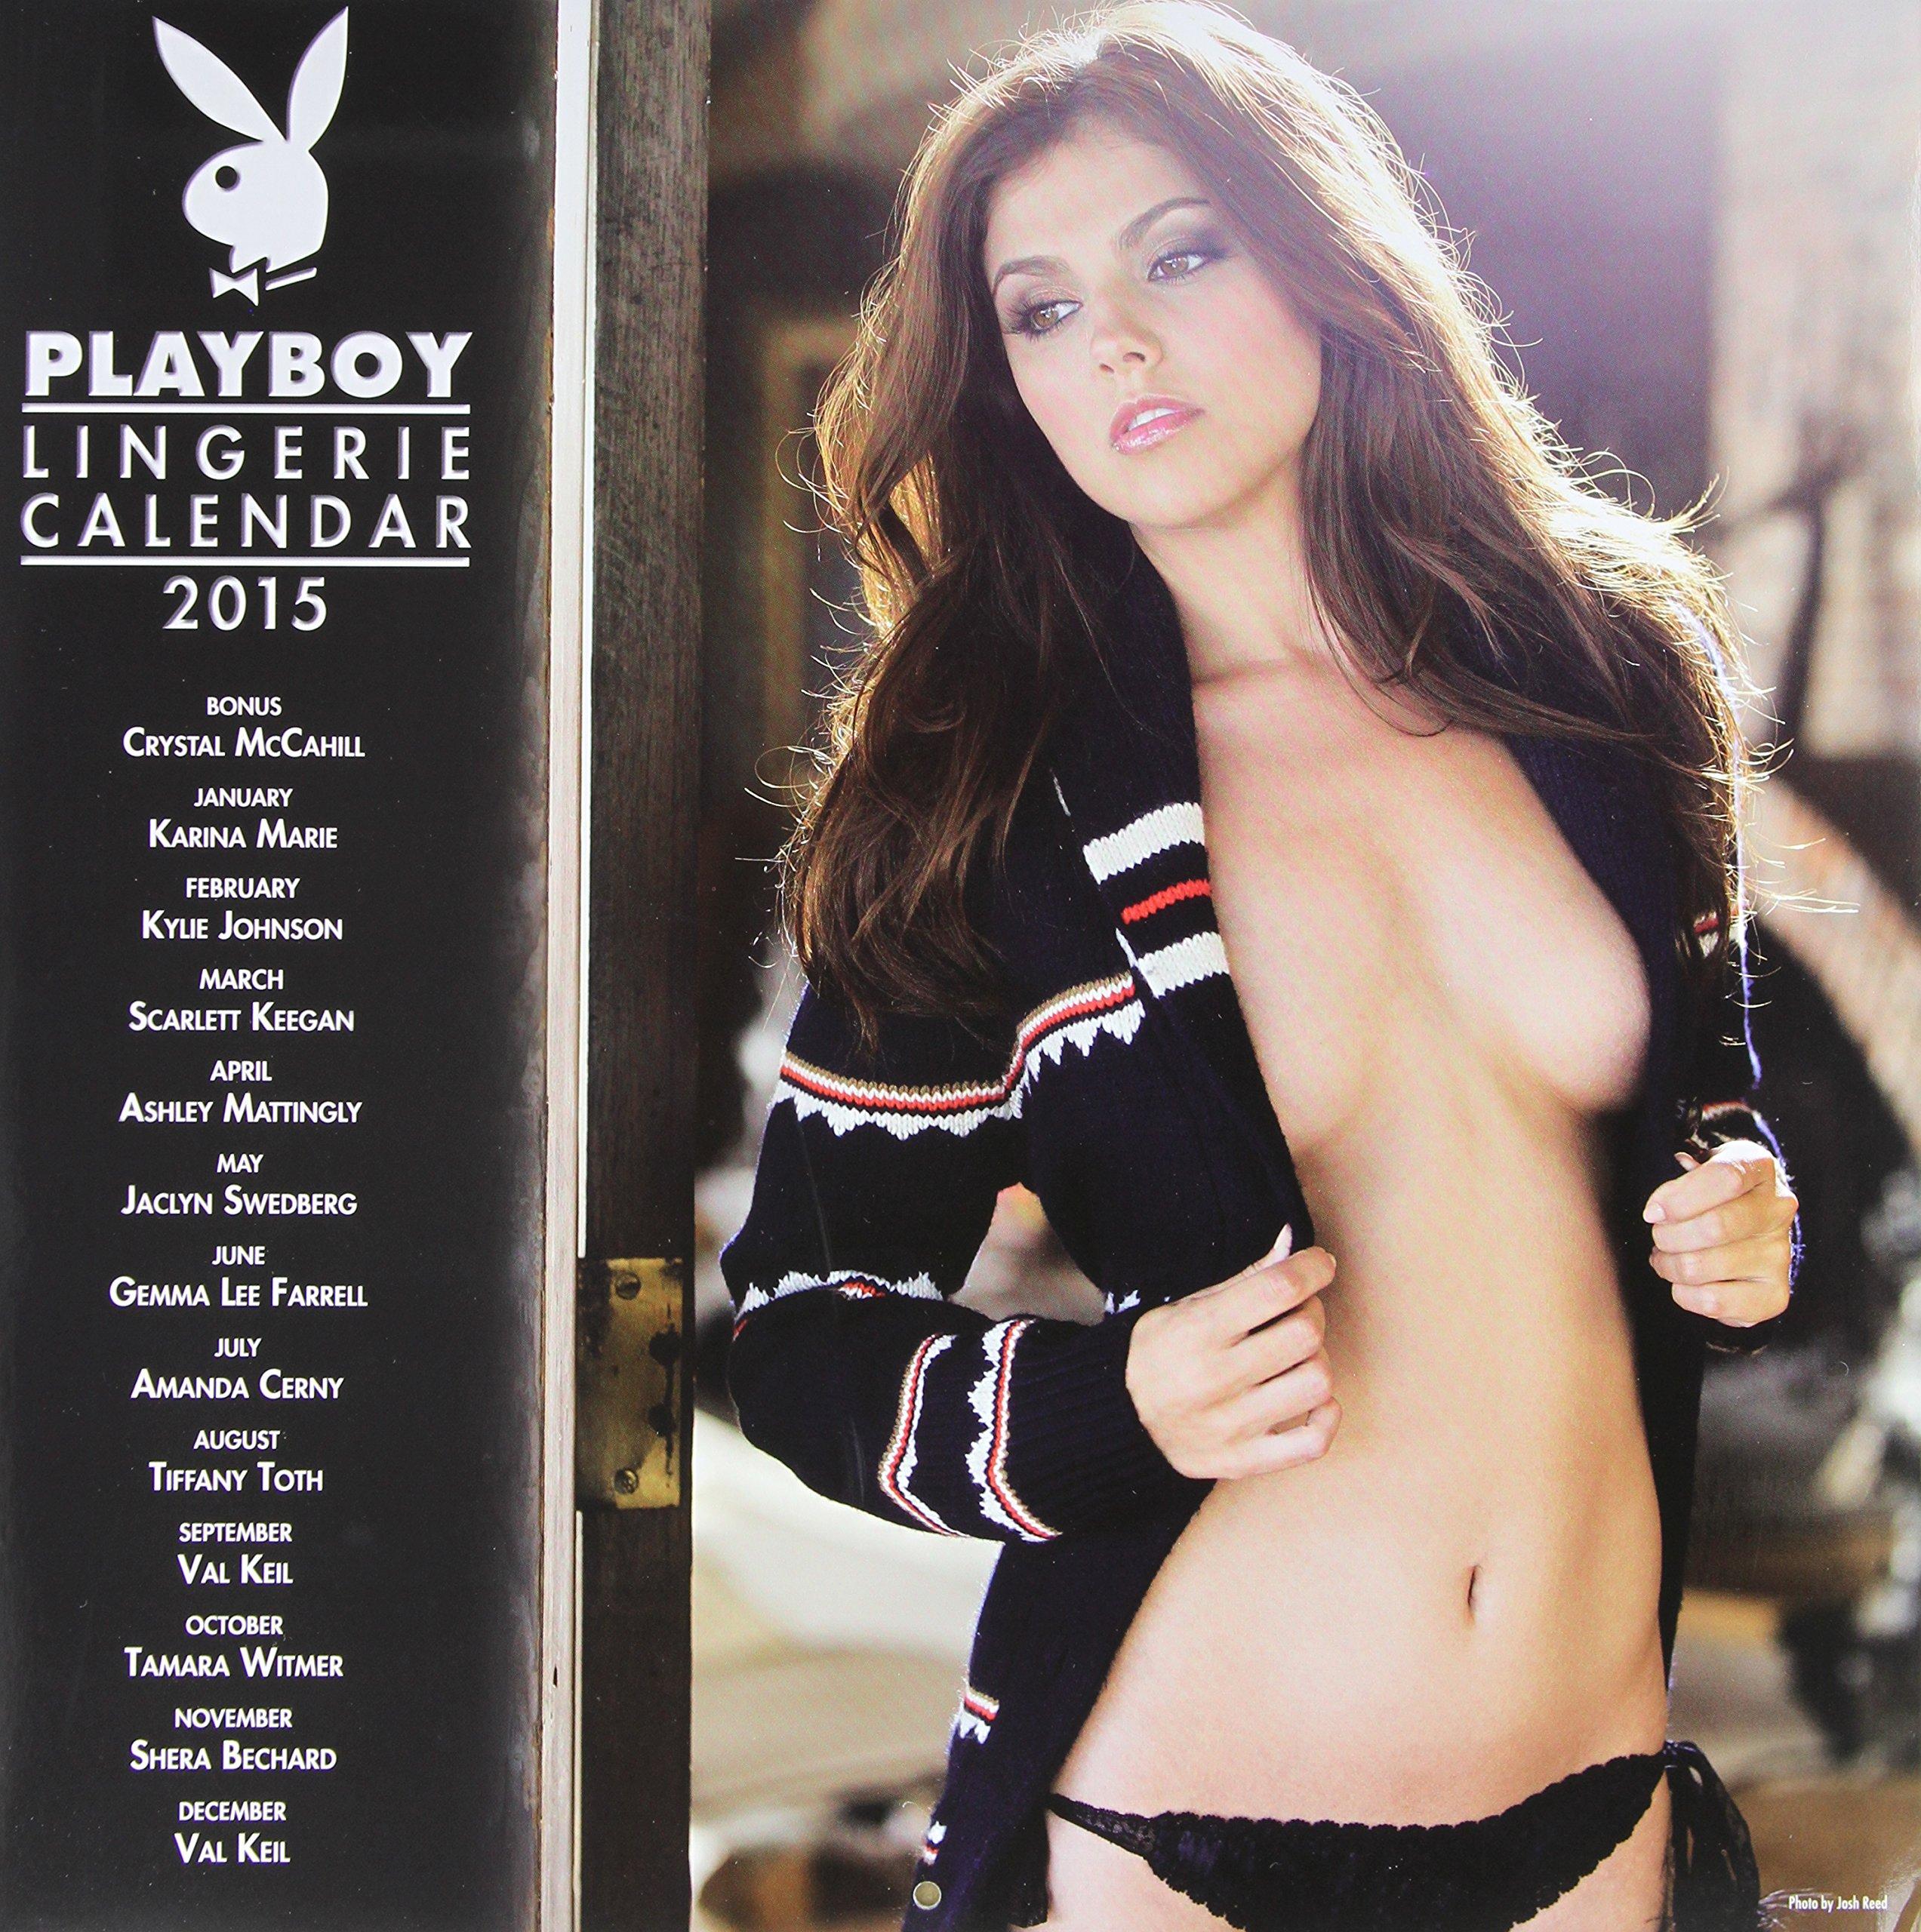 2015 Playboy Lingerie Calendar ebook